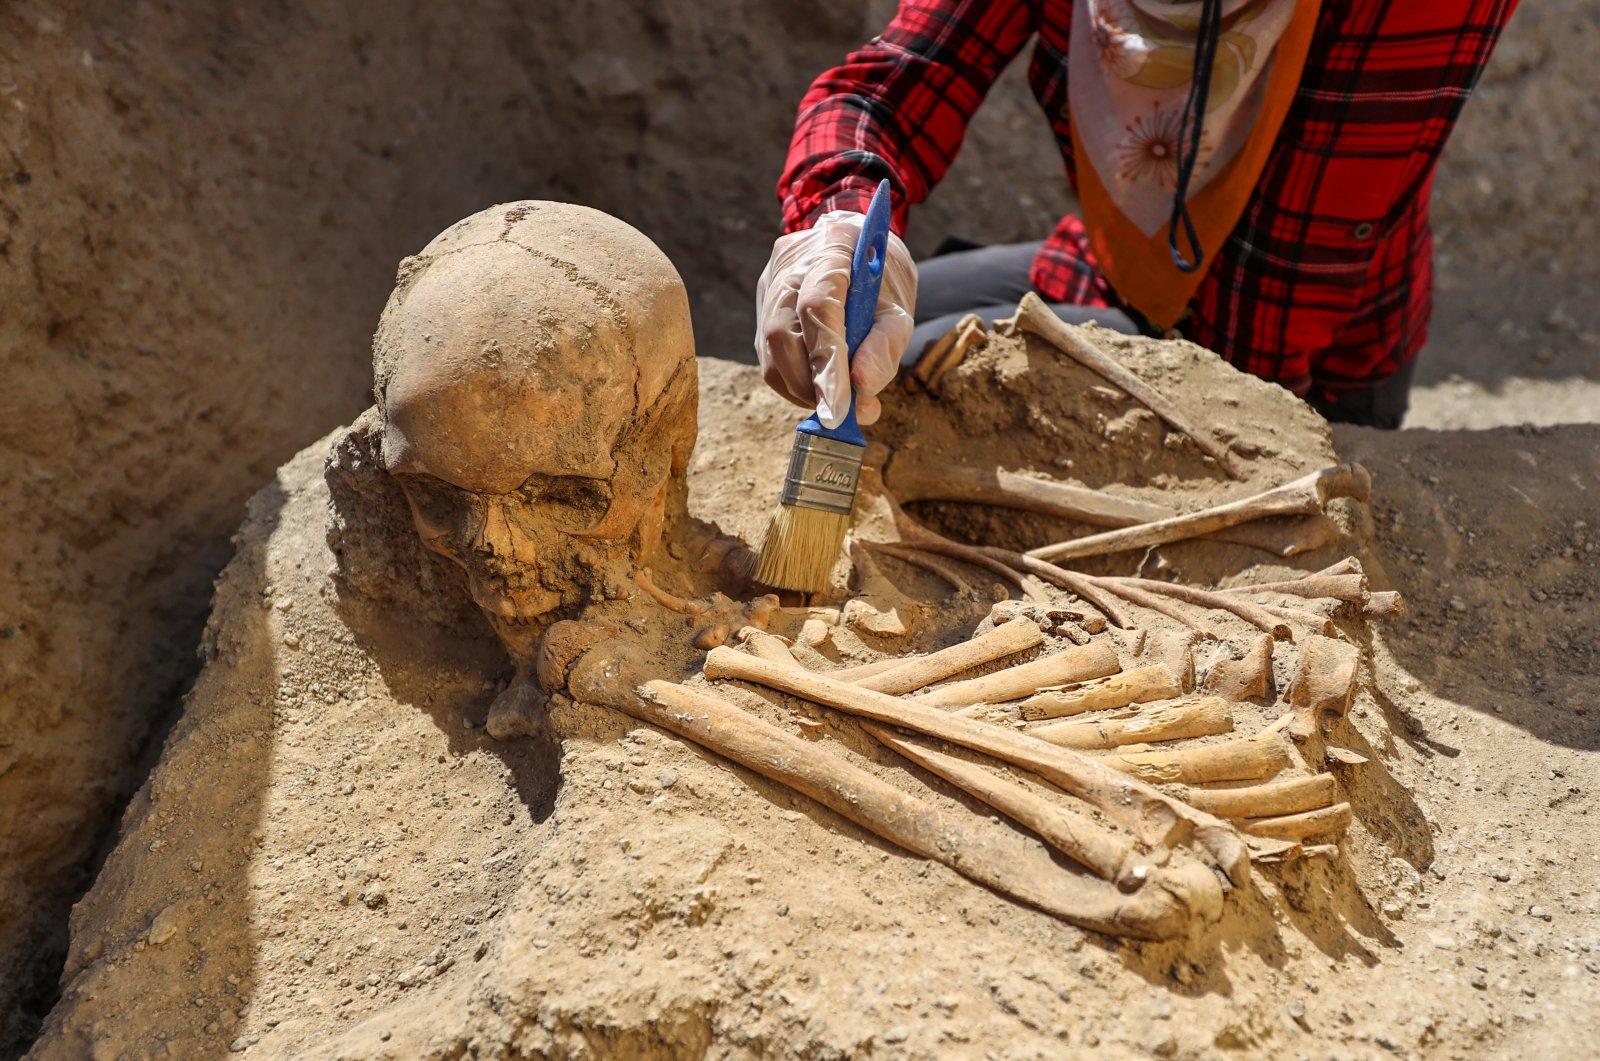 Urartian graves reveal new burial customs in eastern Turkey